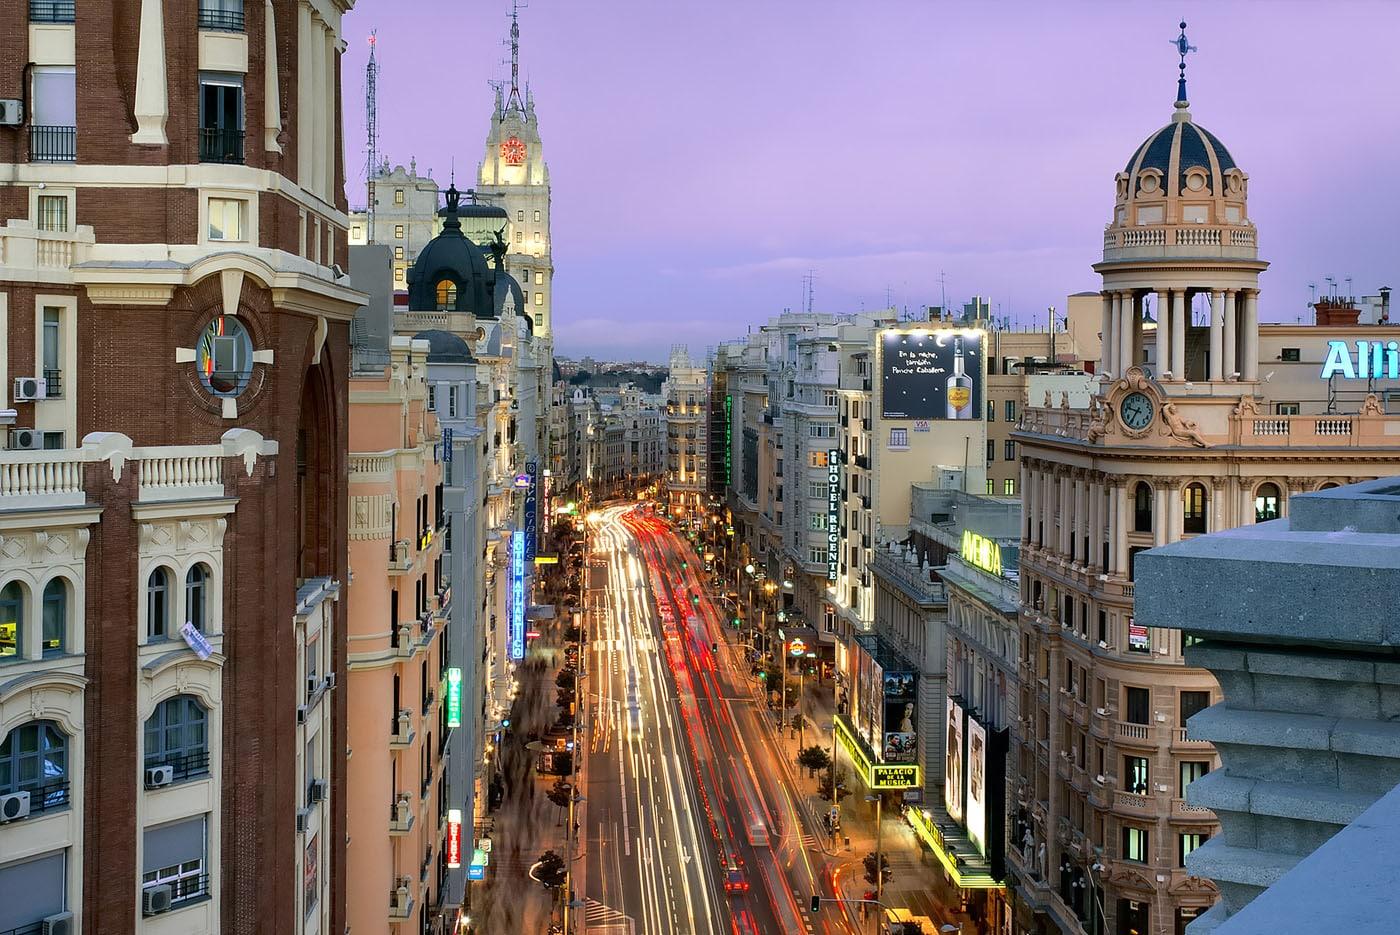 hotel-vincci-capitol-adolfo-gosalvez-hoteles-panoramicos